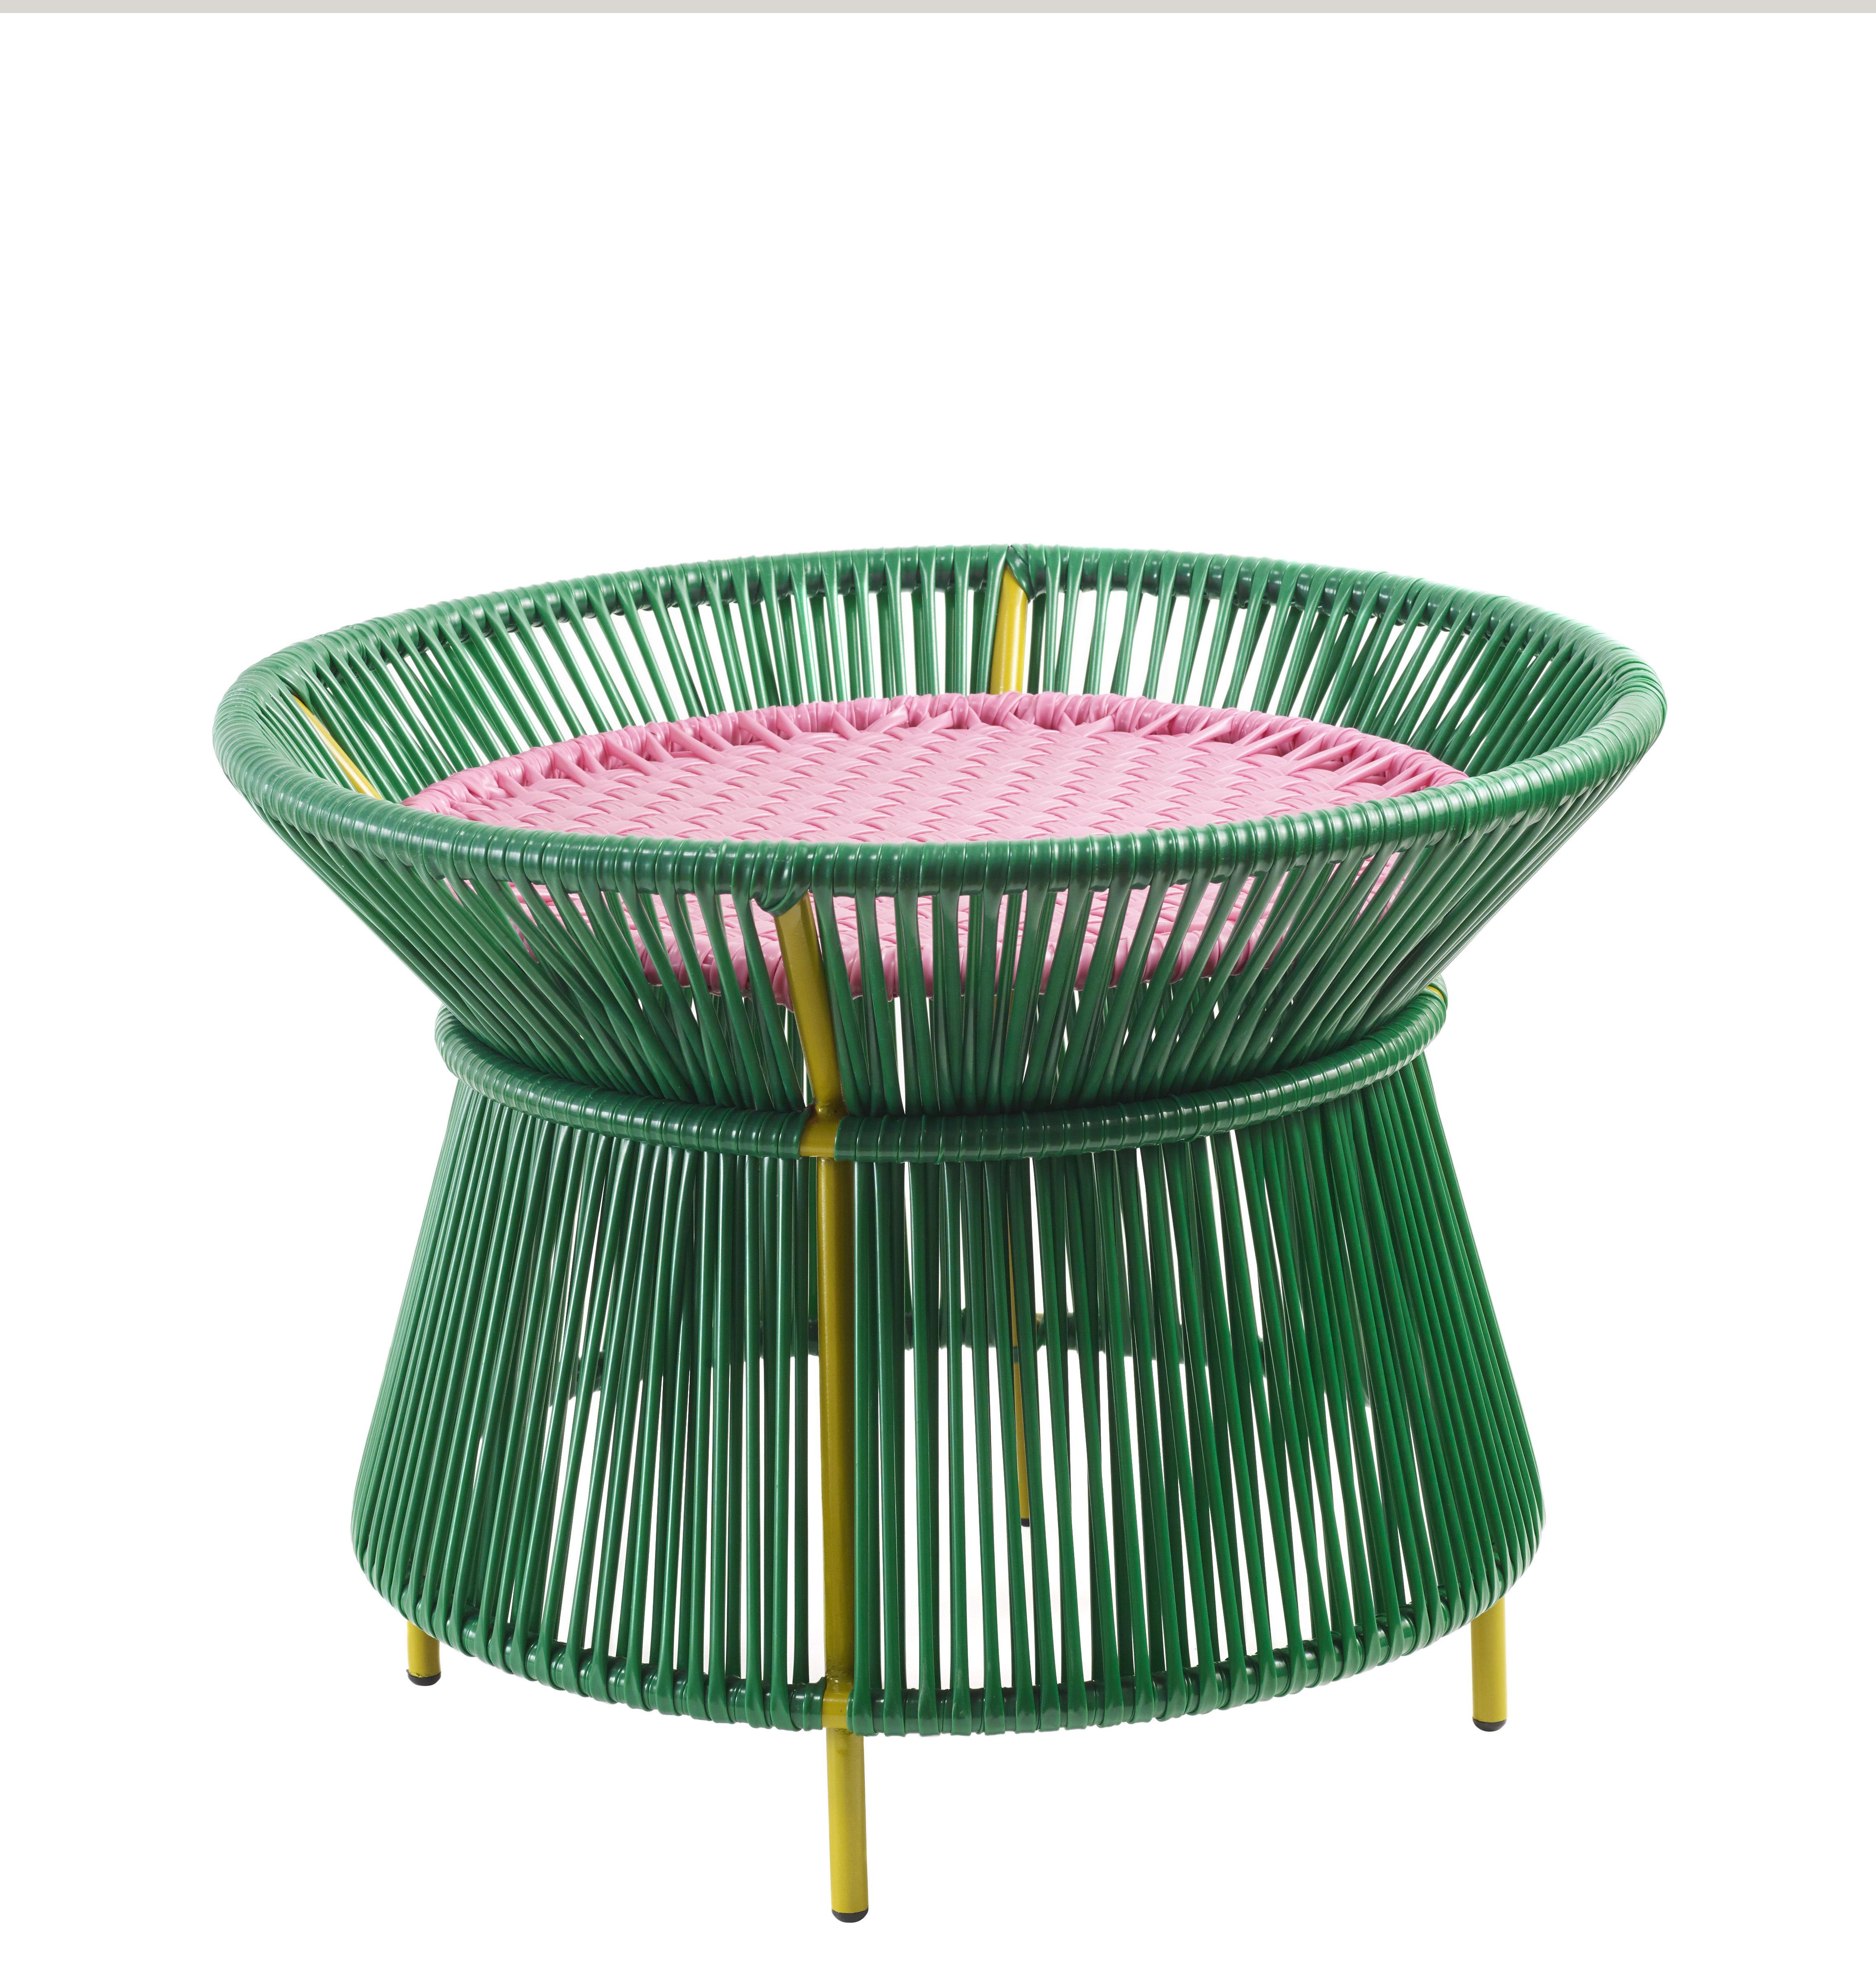 Arredamento - Tavolini  - Tavolino Caribe Basket - / Ø 54 x H 41 cm di ames - Verde & rosa / Piedi curry - Acier galvanisé thermo-laqué, Fils de plastique recyclé